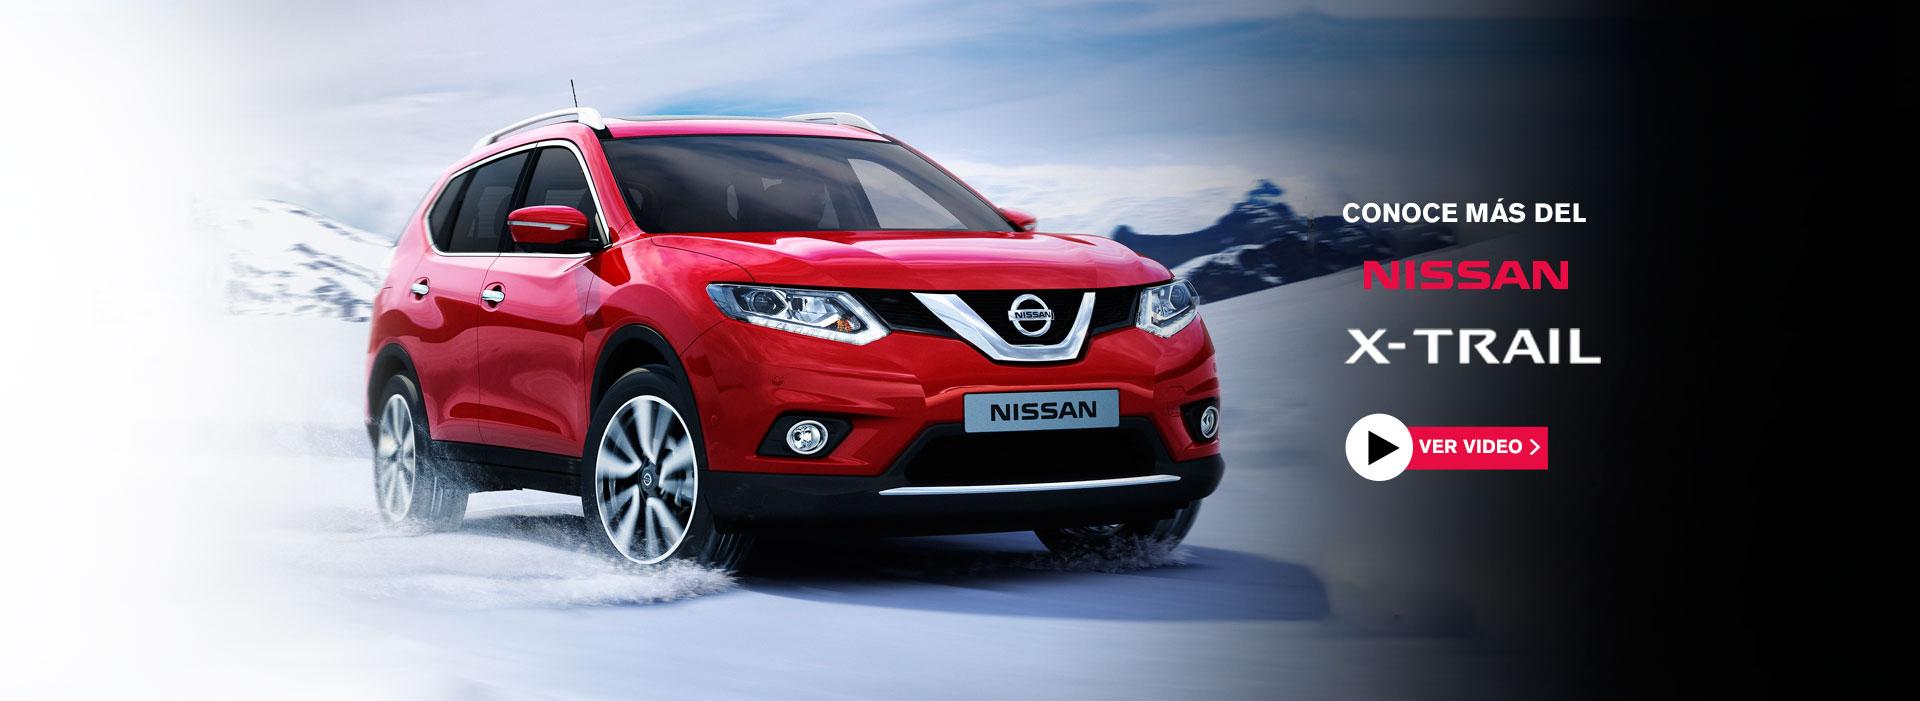 Conoce Nissan X-Trail